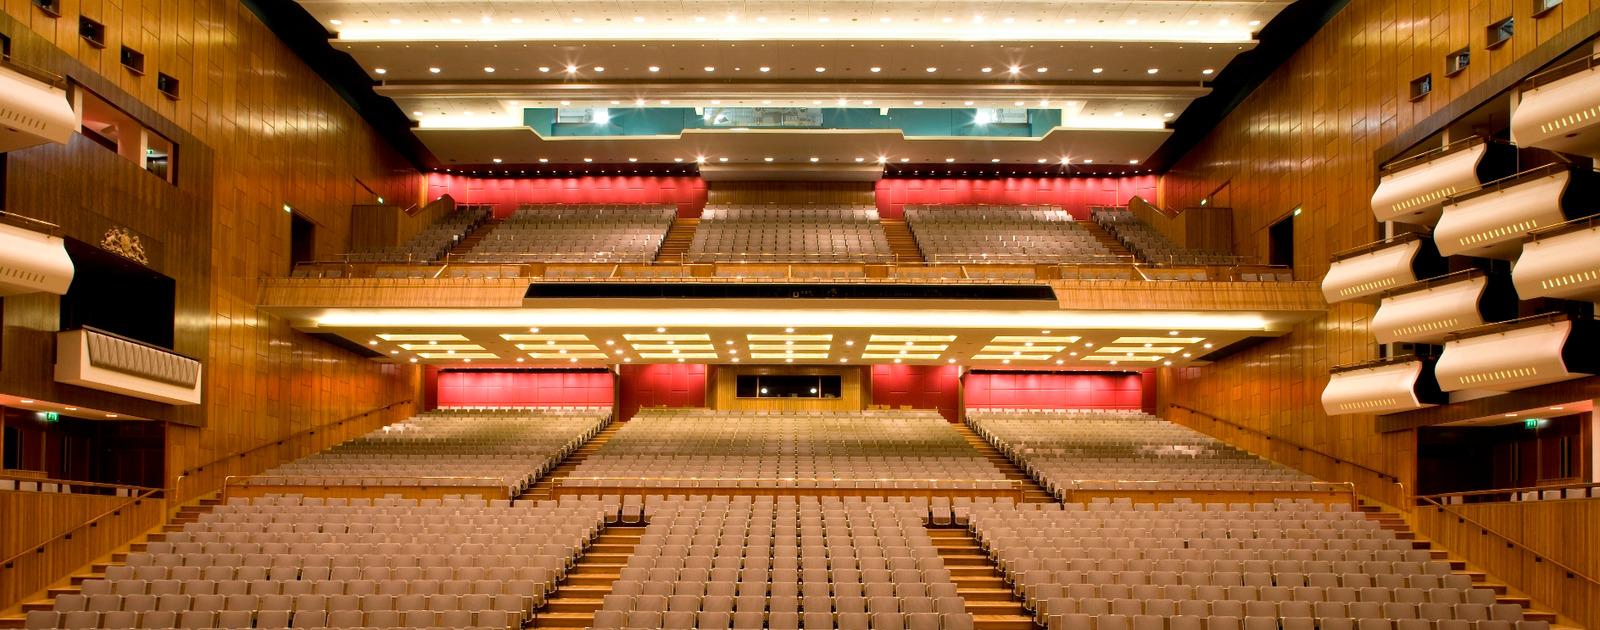 hero1600x630-royal-festival-hall-auditorium-2-copyright-morley-von-sternberg